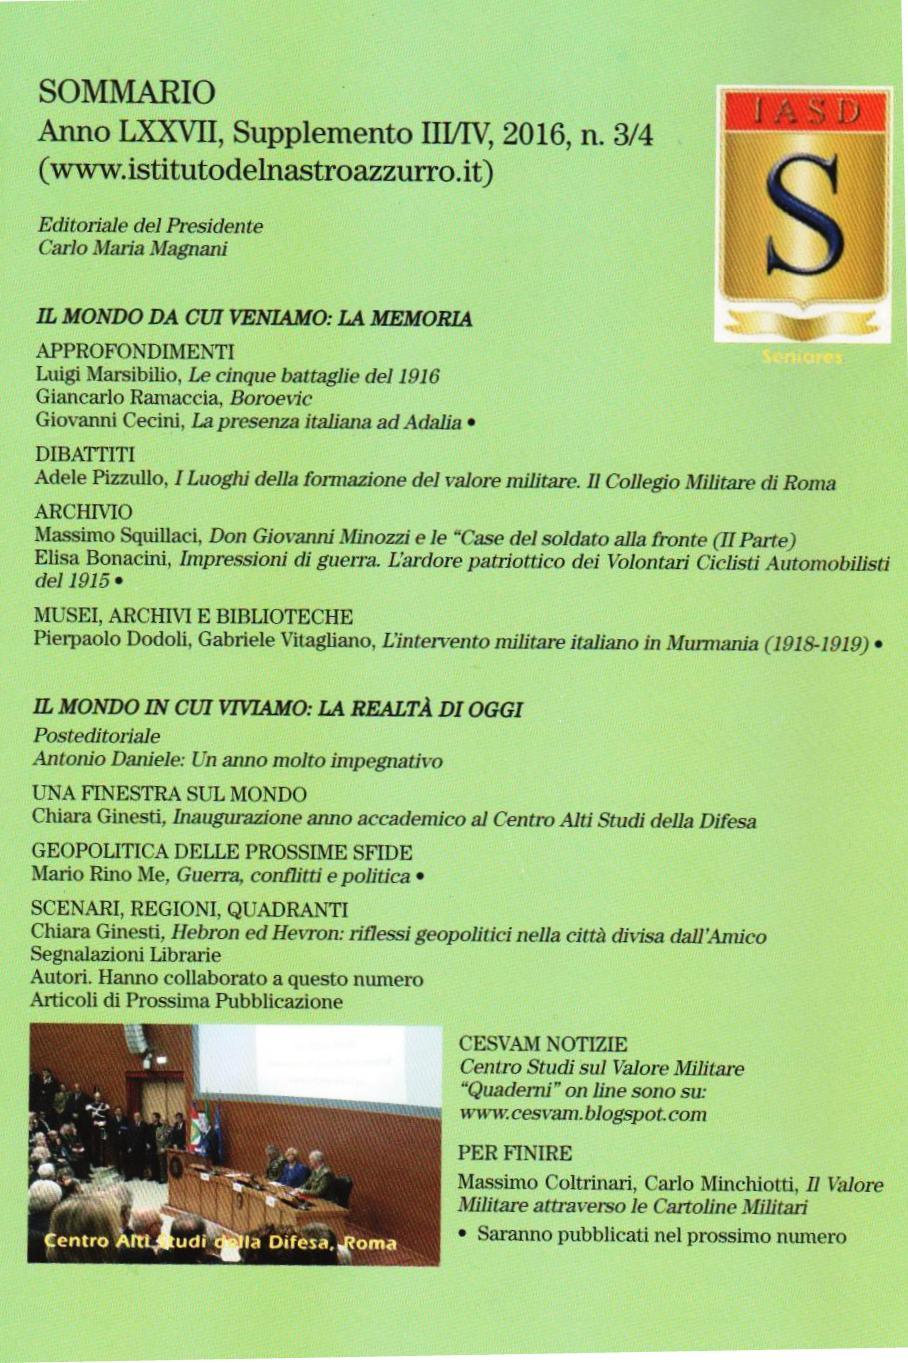 Quaderni n. 3/4 2016